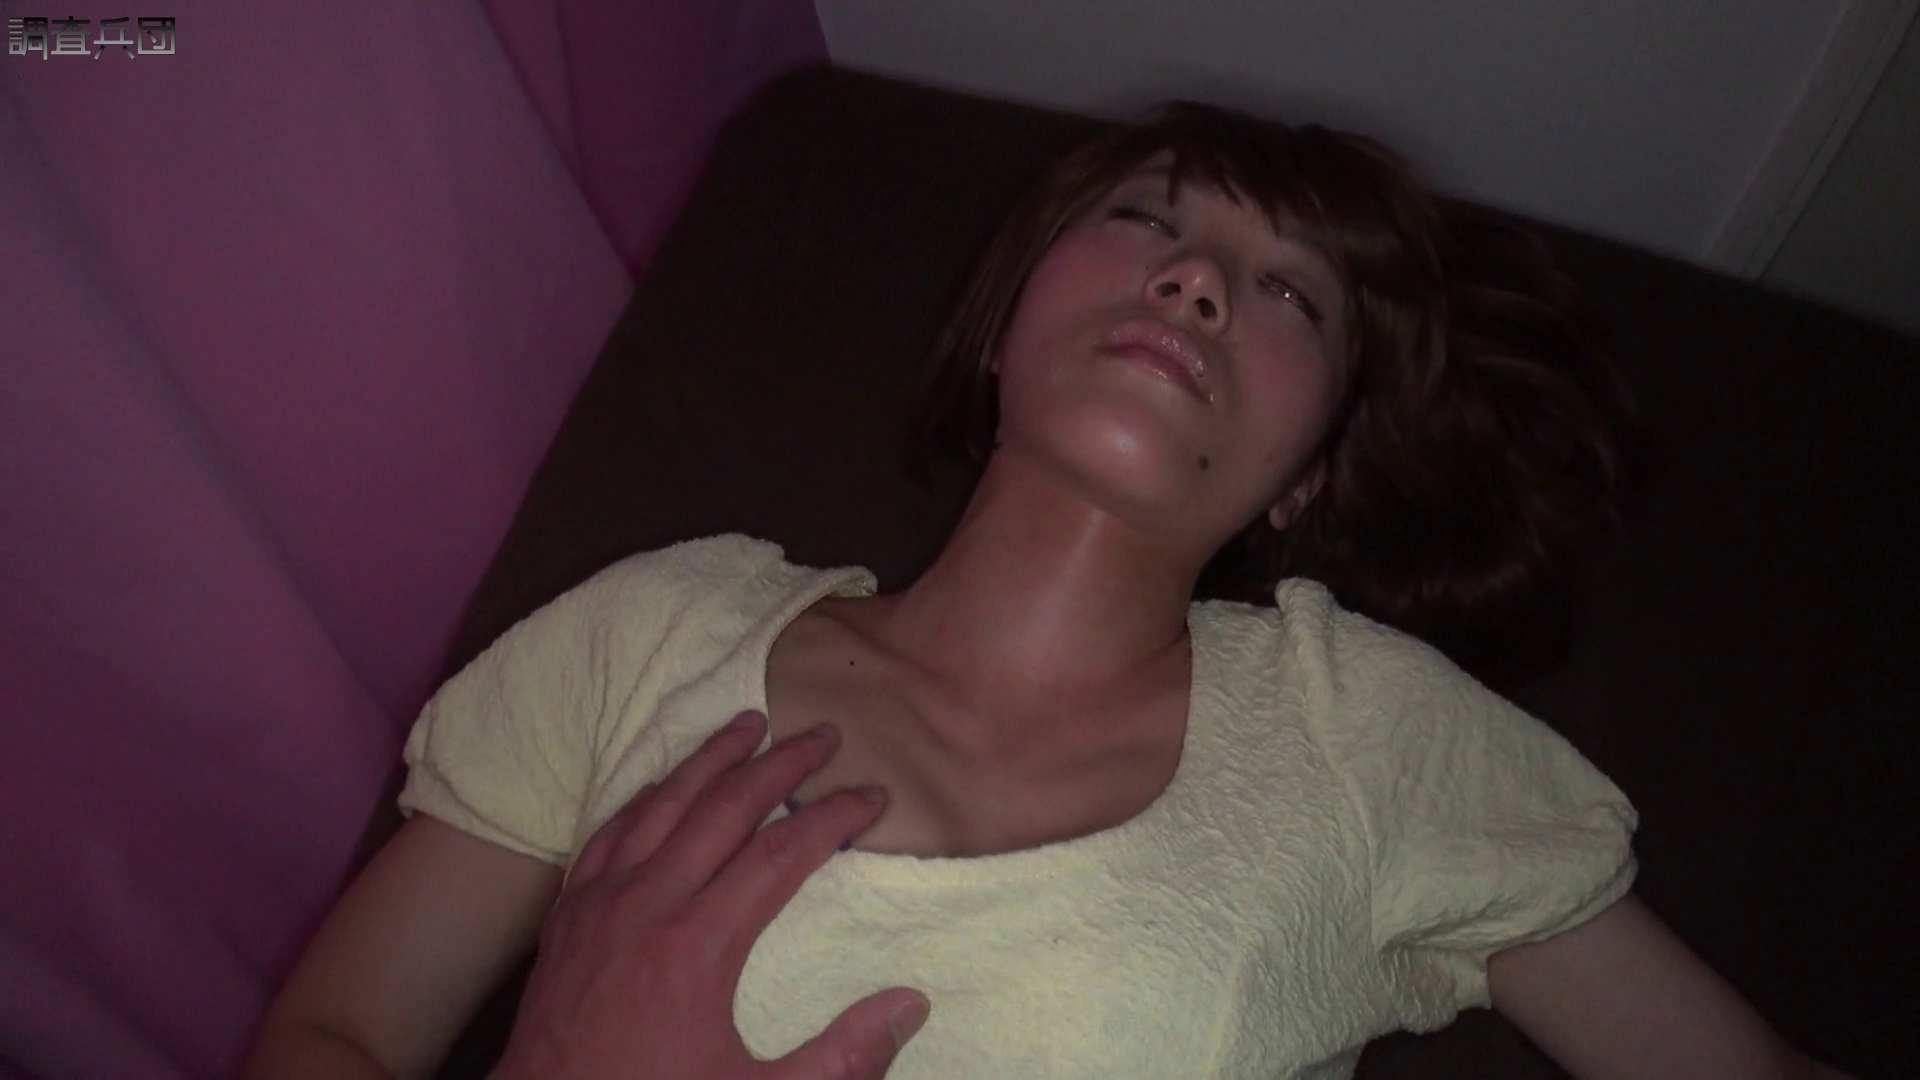 RE:~反撃の悪戯~vol.23 危険で淫靡な香りのする・まりりん 悪戯 SEX無修正画像 89画像 41